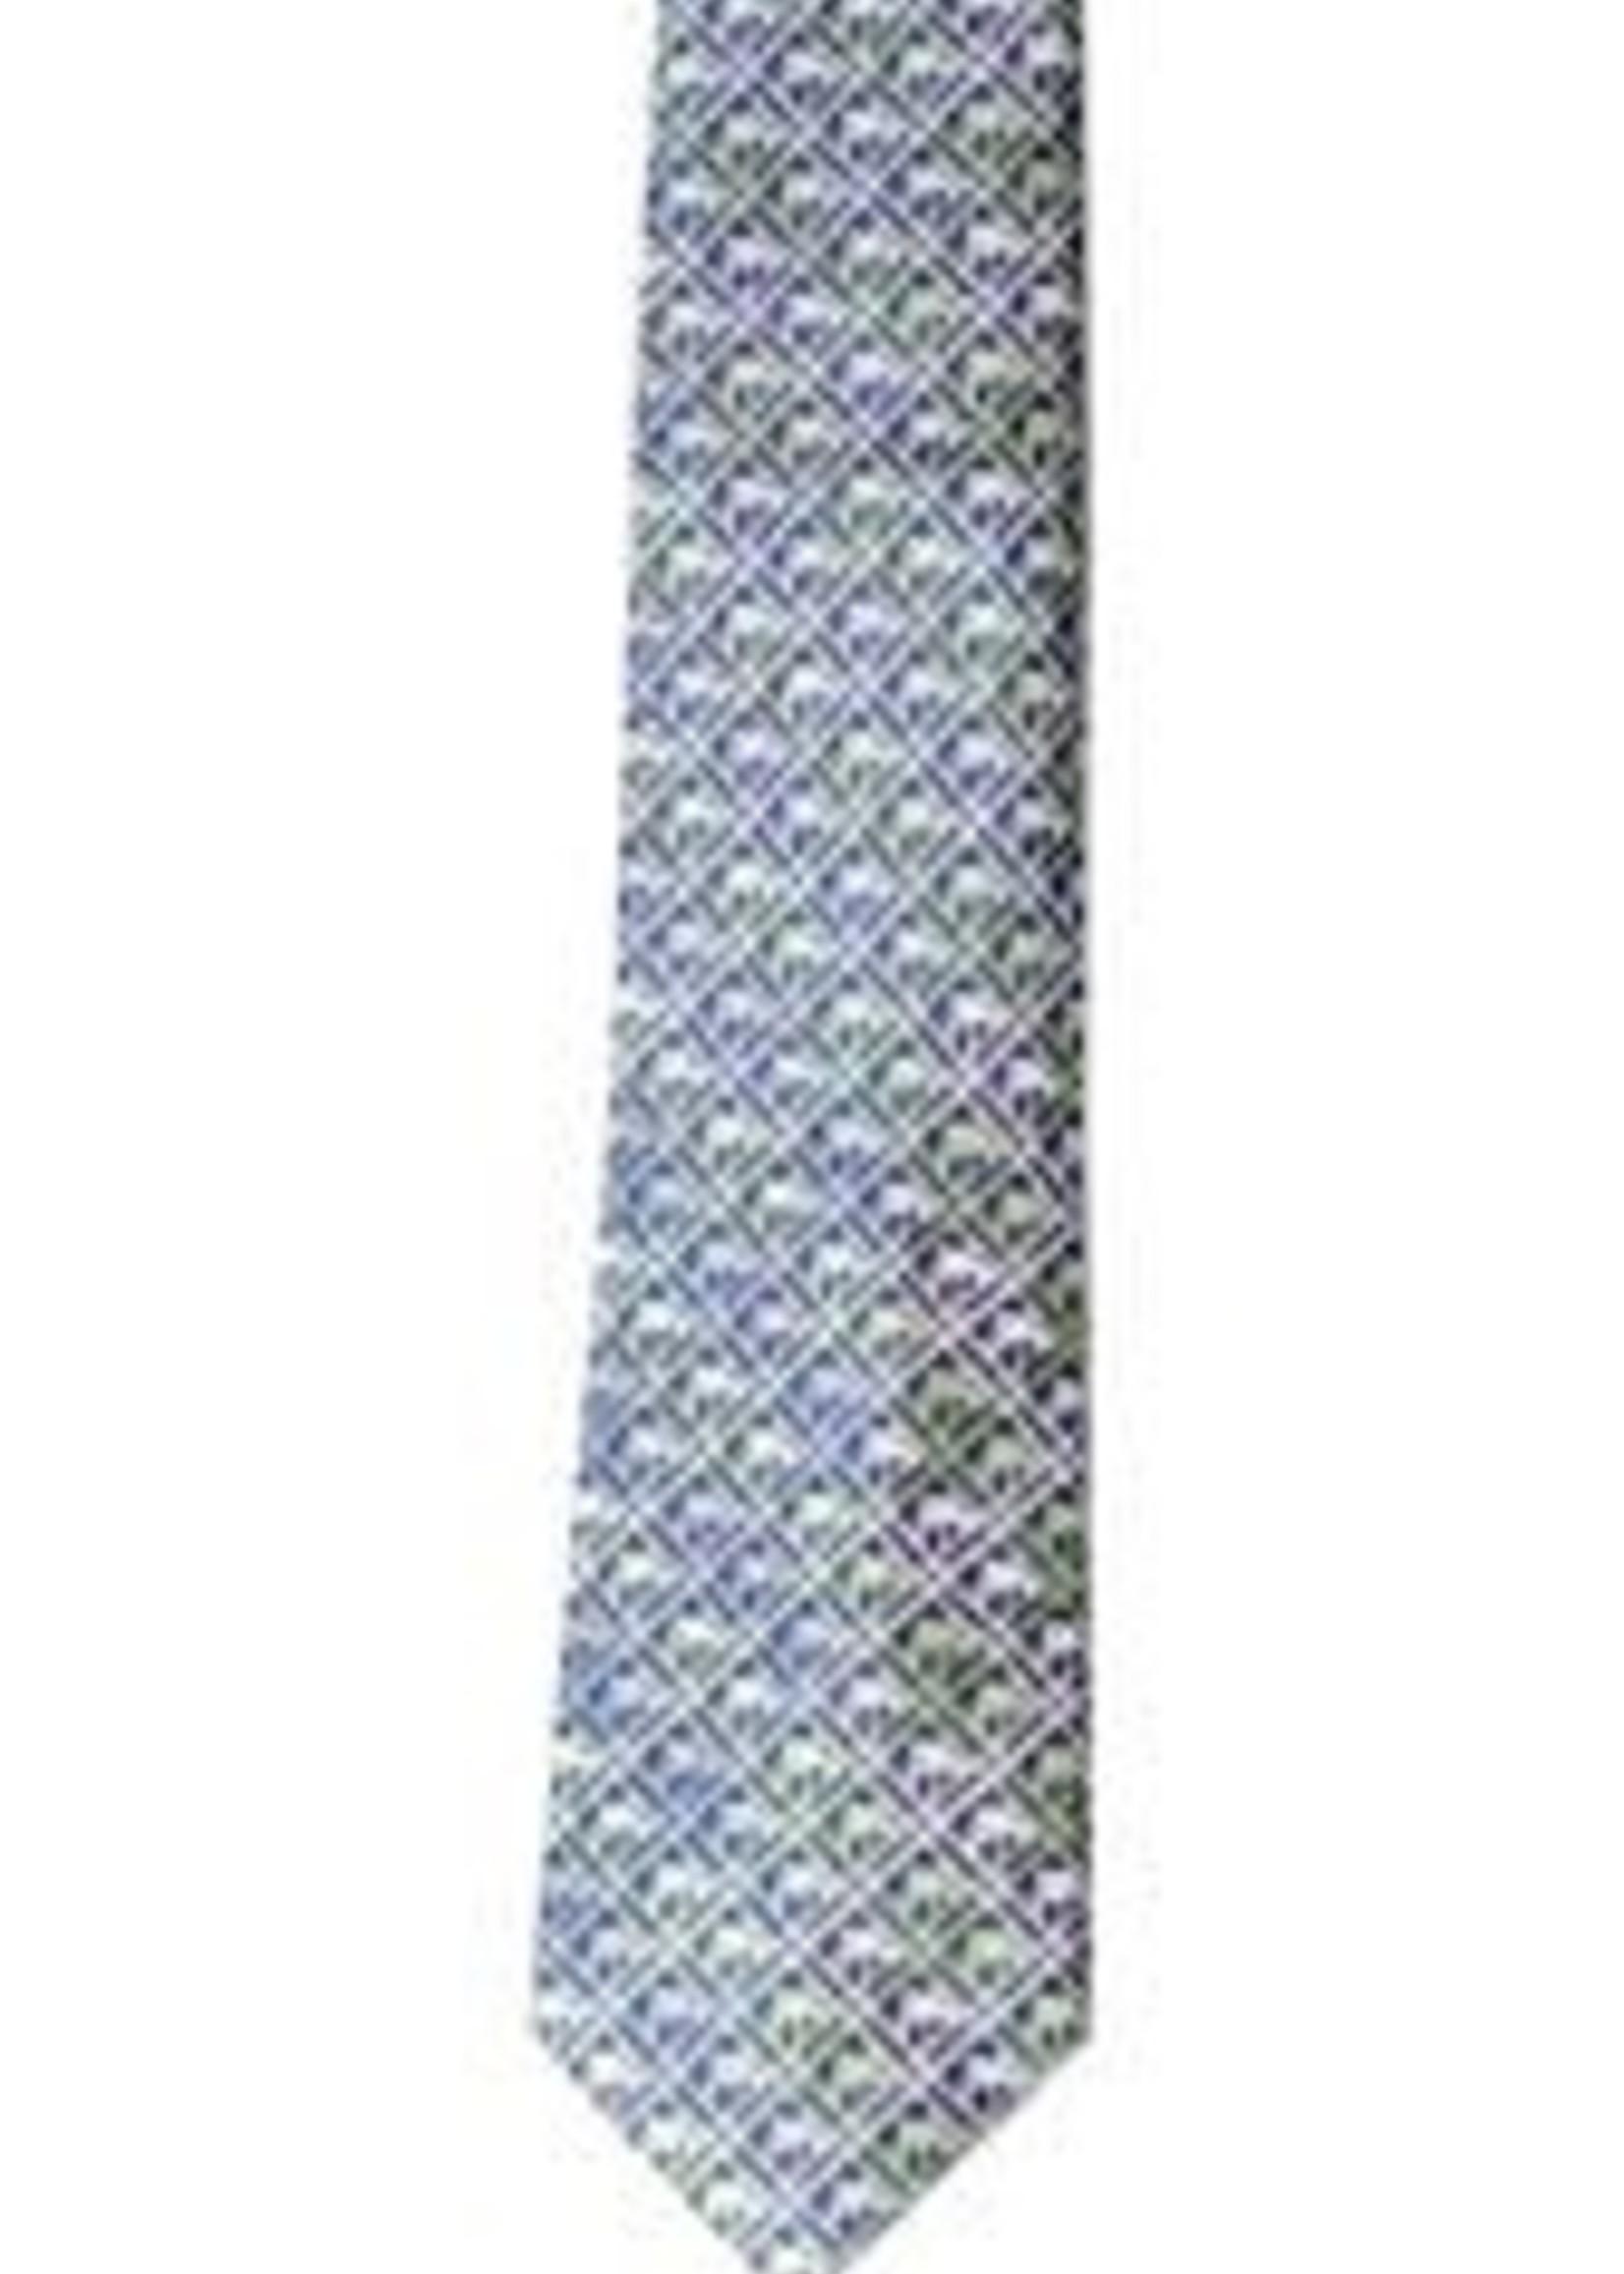 Pineapple Palaka Pineapple Palaka Ties -  Palm Tree Navy  Necktie